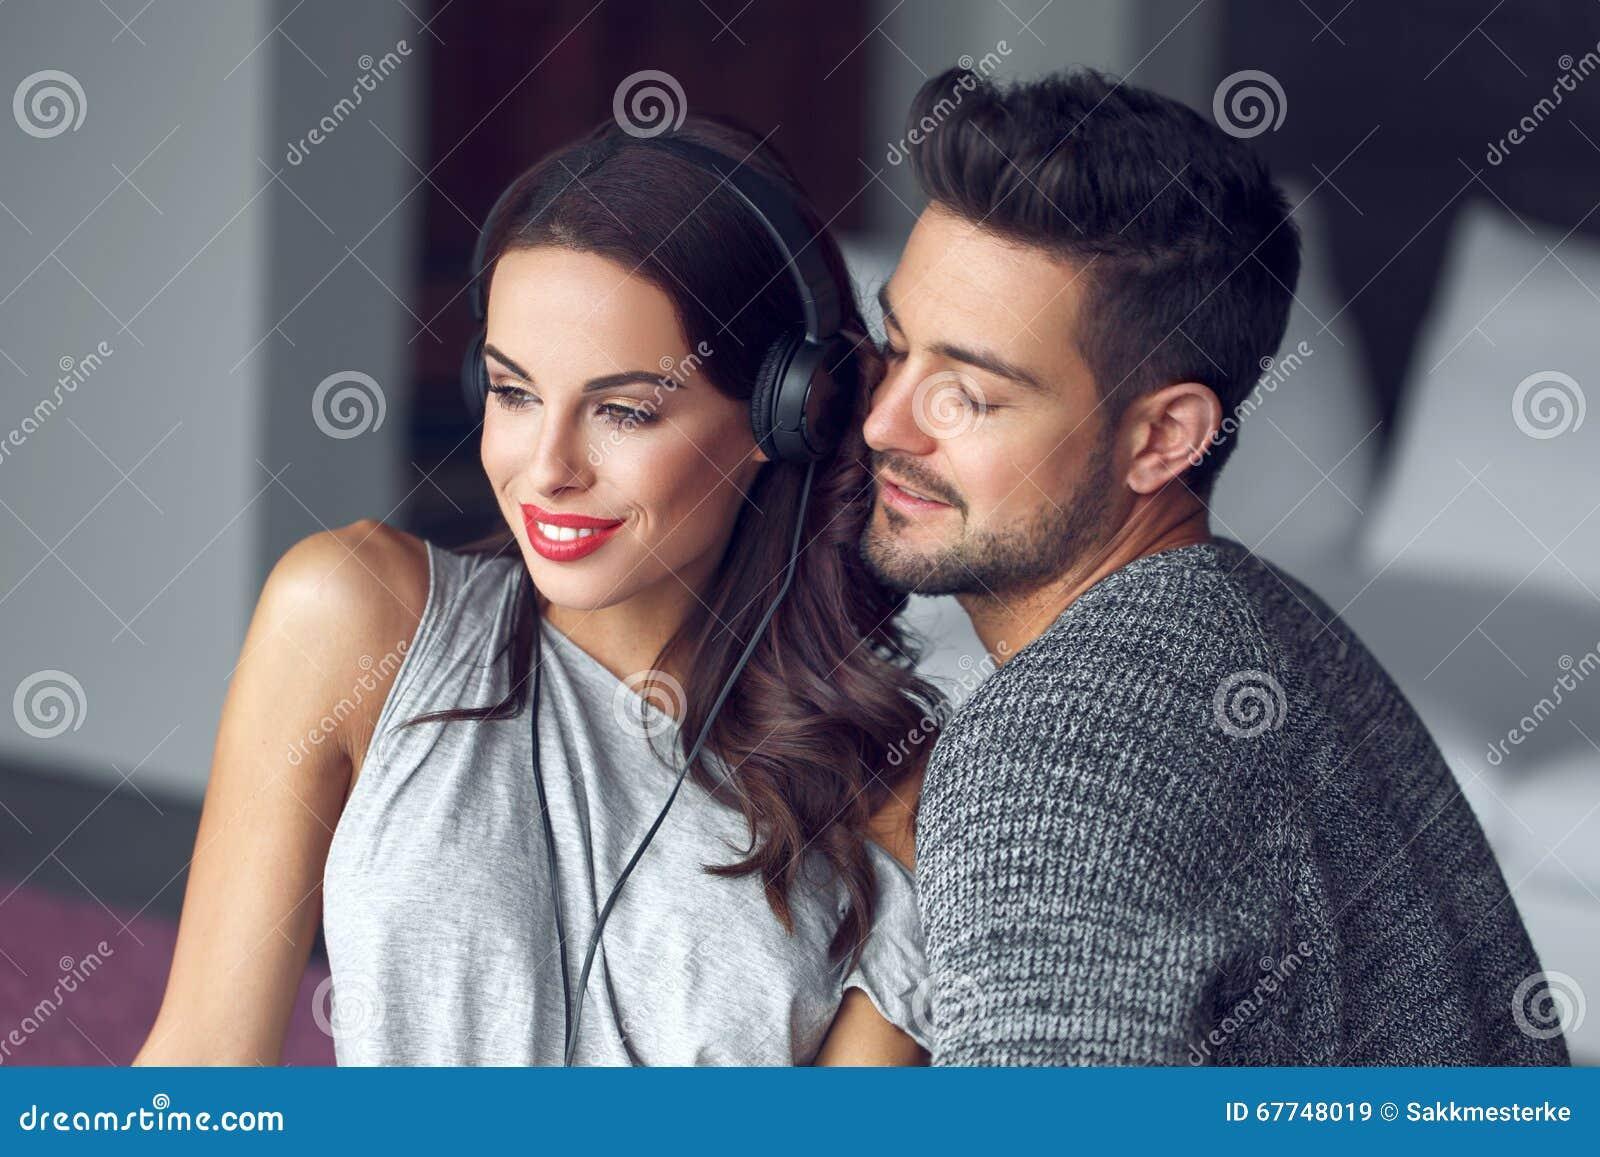 Upbeat romantic songs